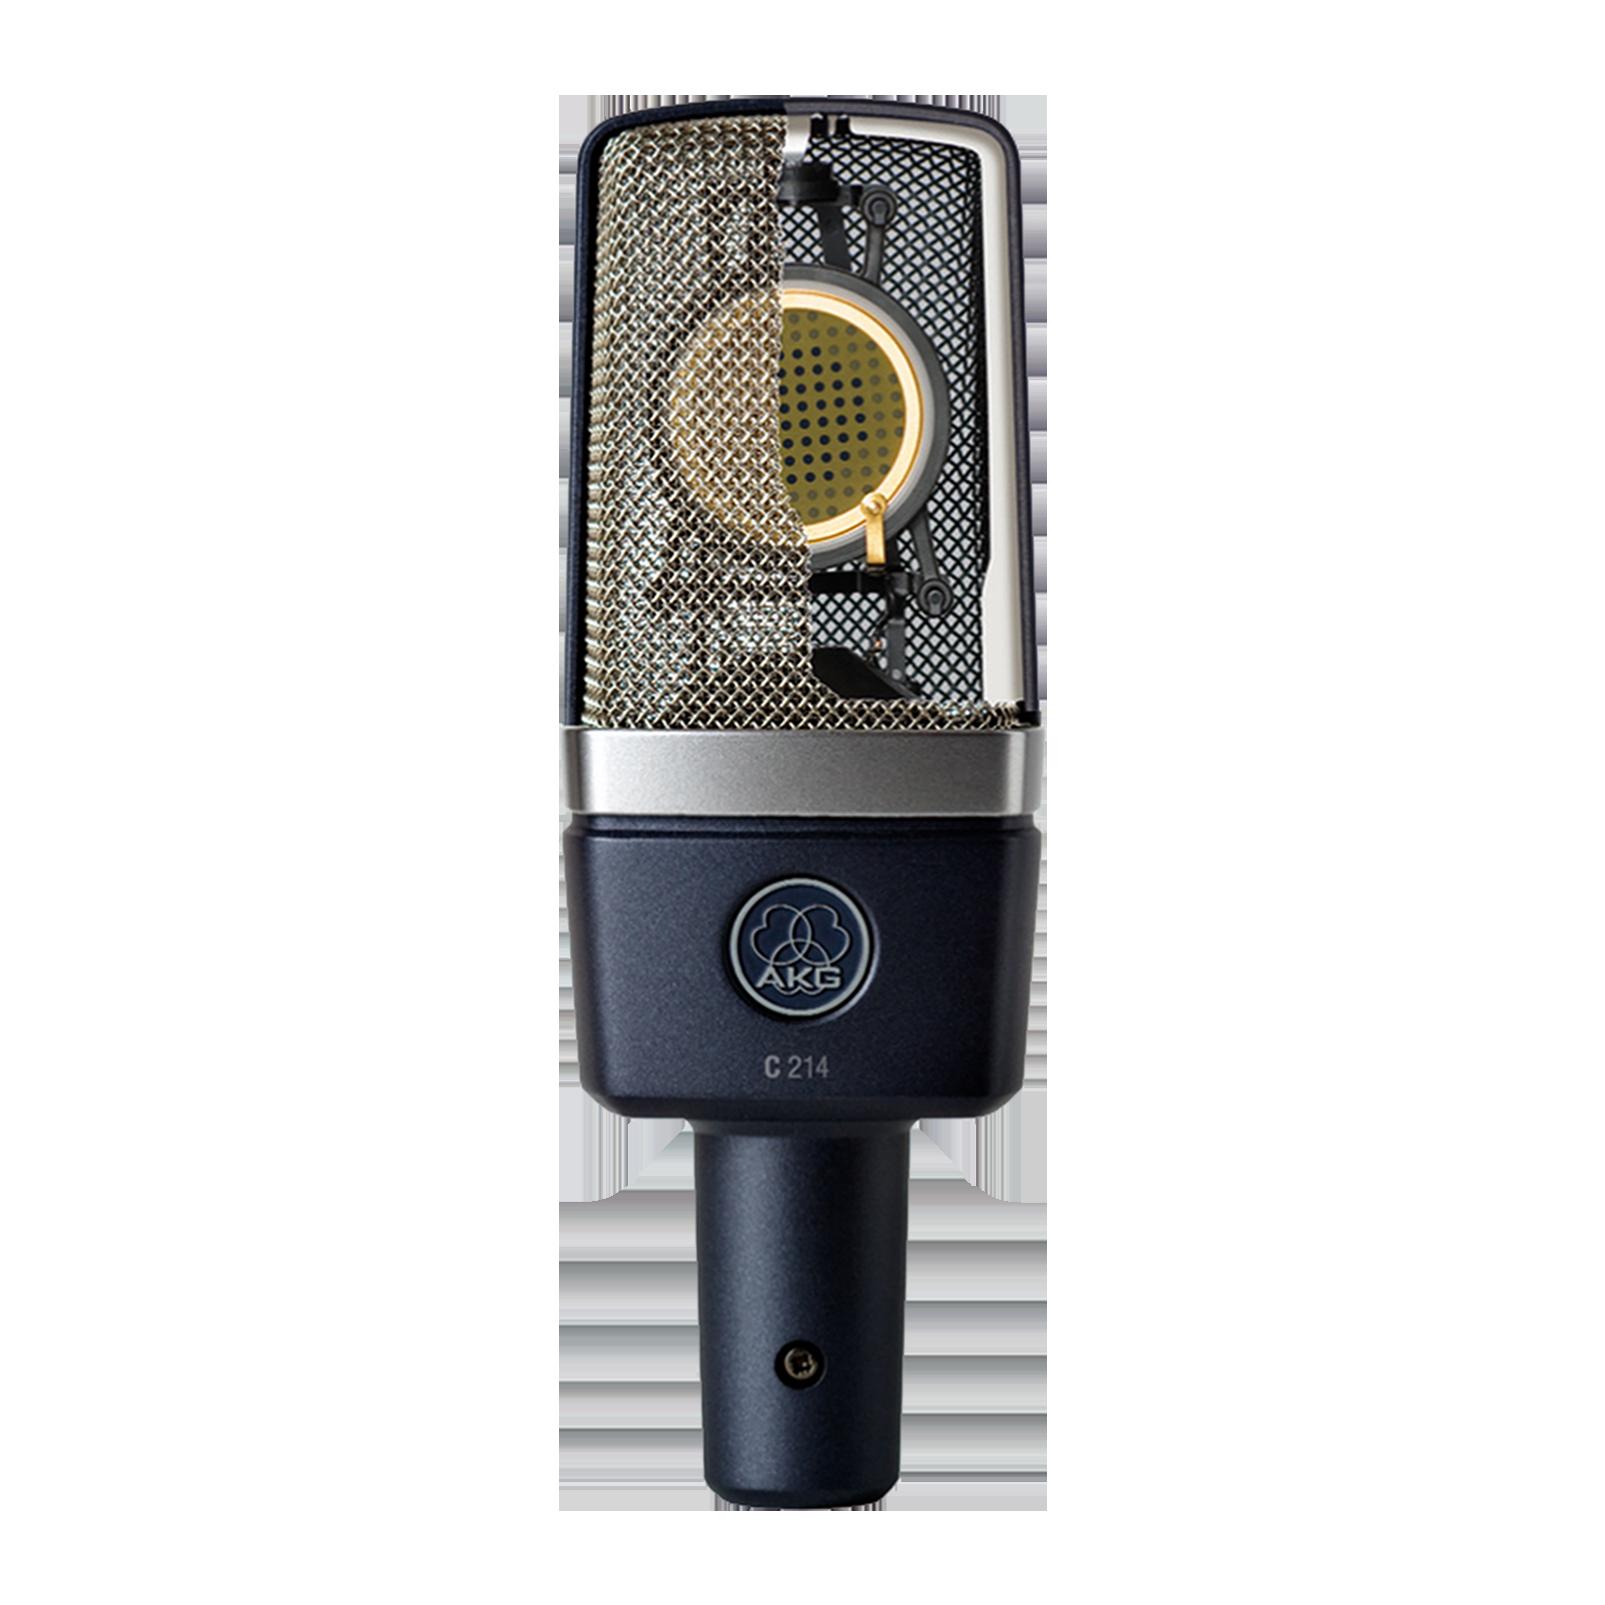 C214 - Black - Professional  large-diaphragm  condenser microphone - Detailshot 1